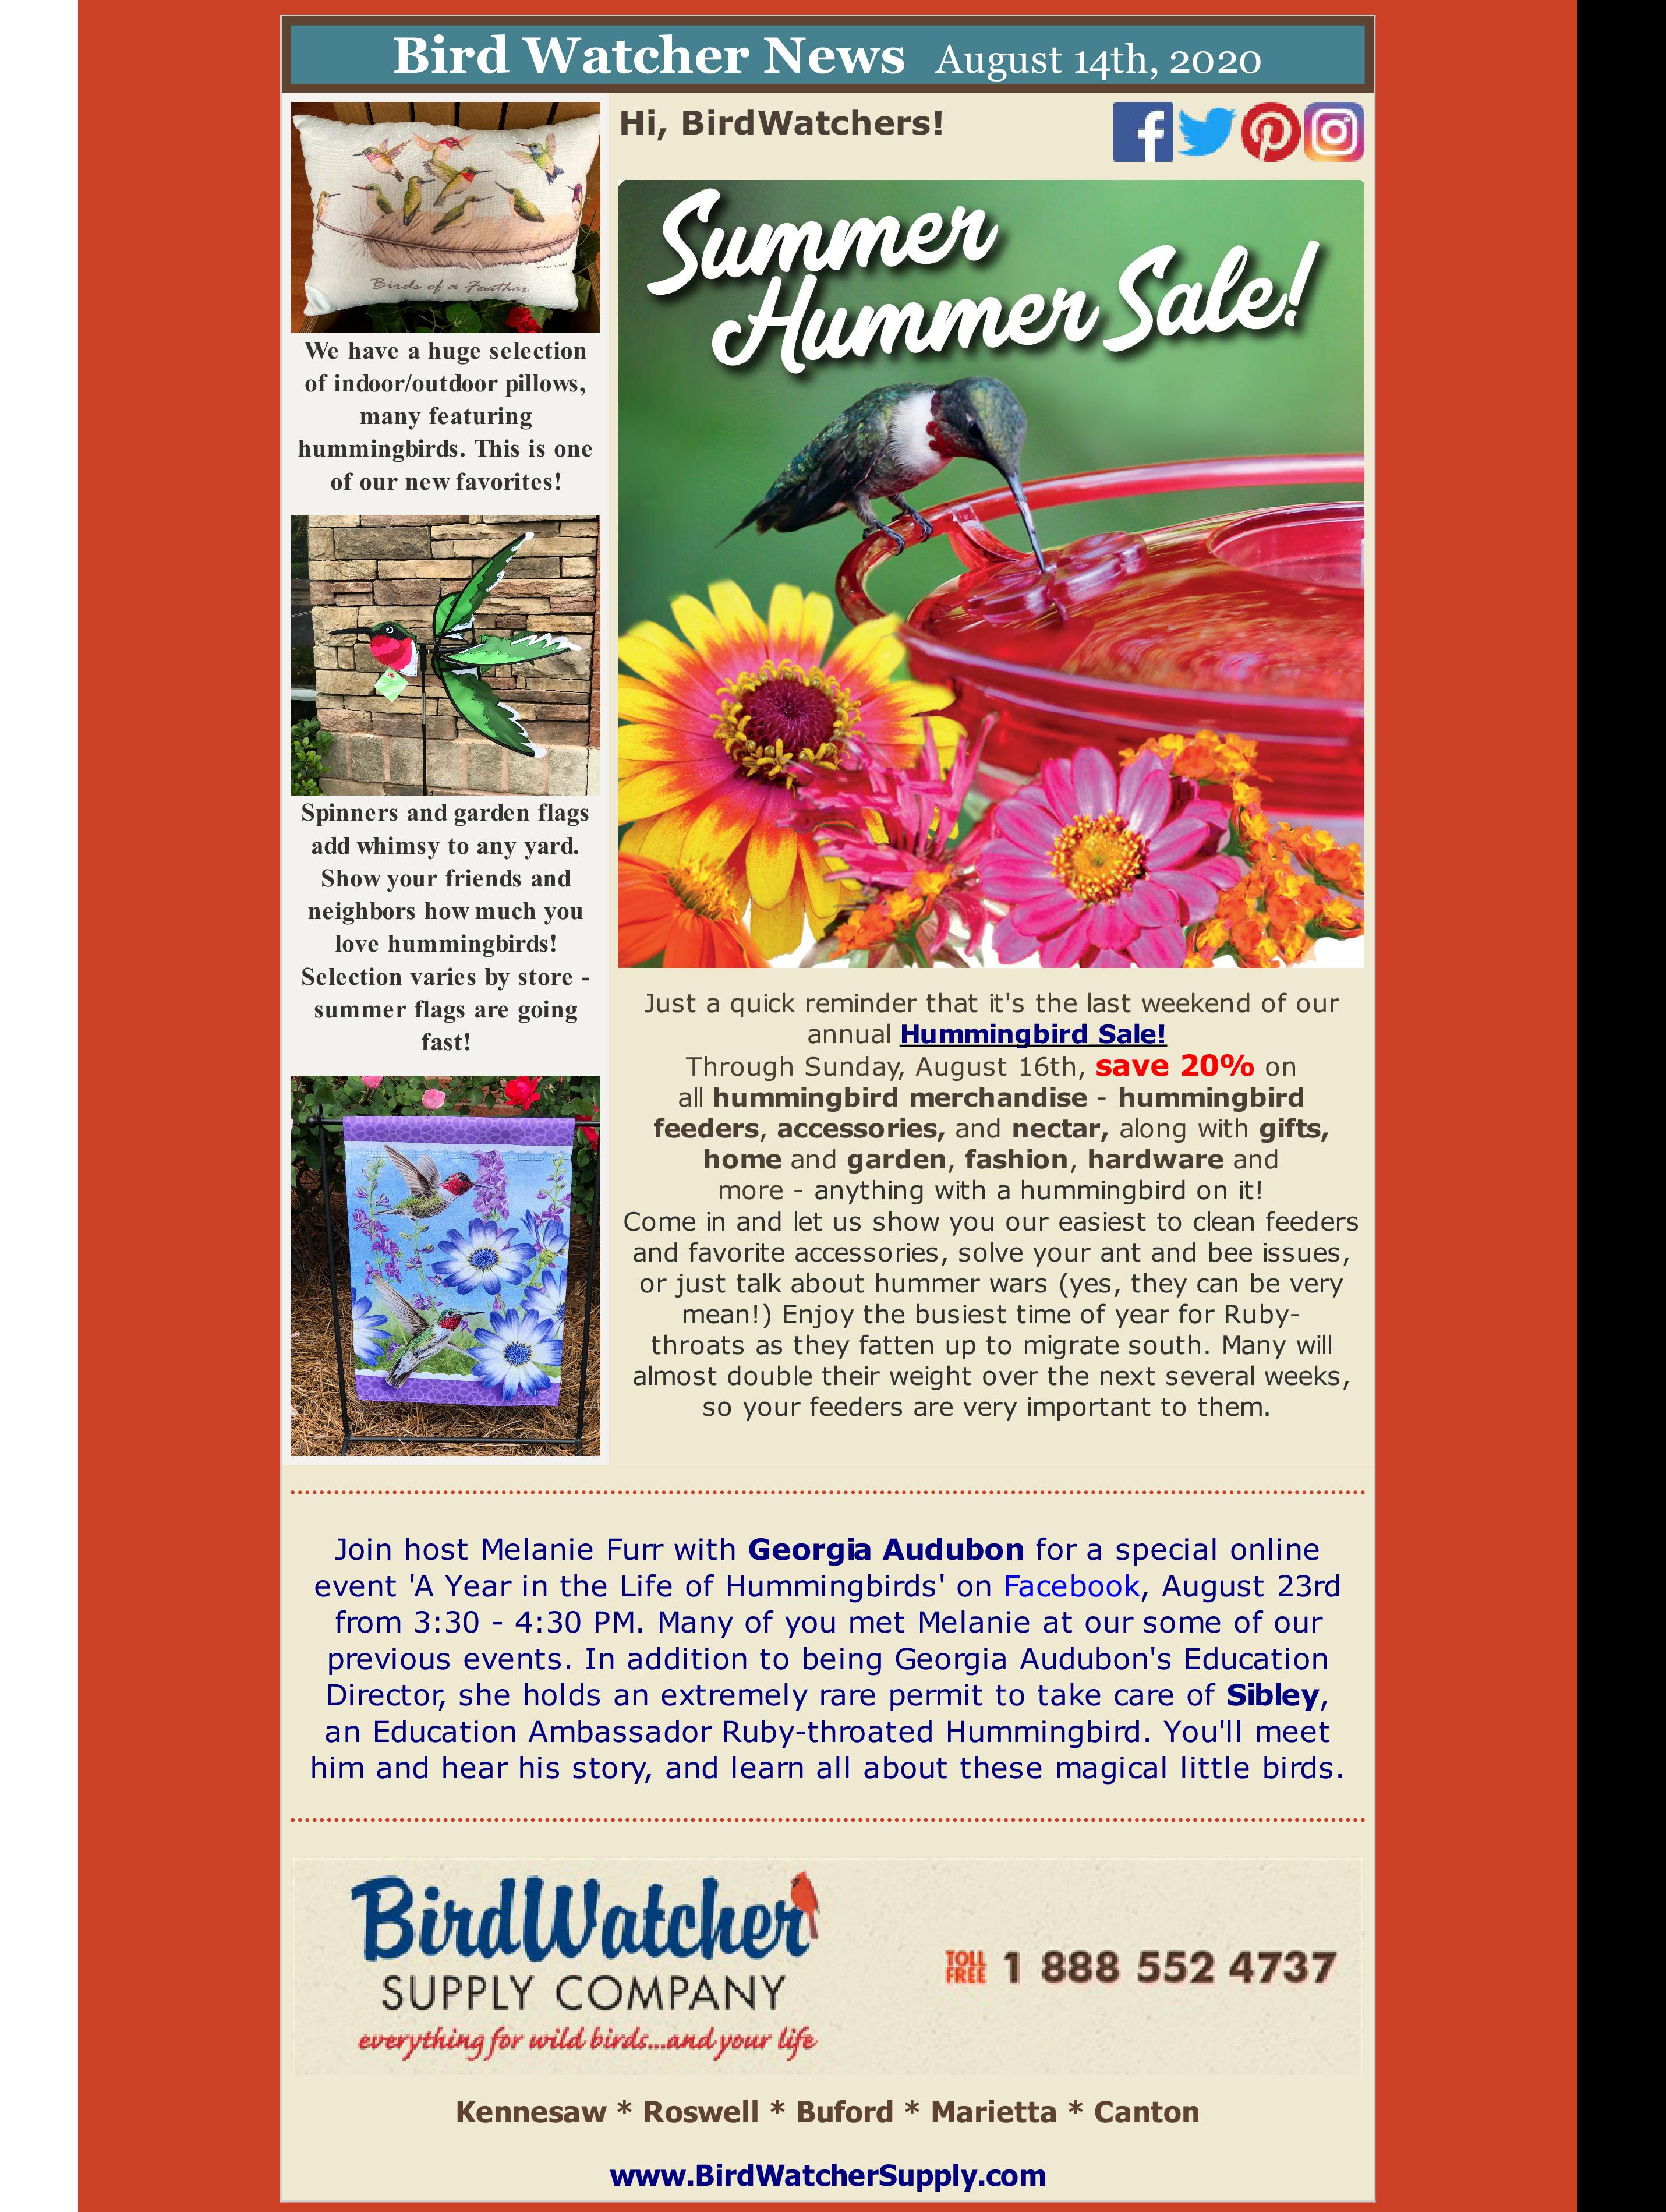 hummingbirds, hummers, garden, birds, spinners, feeders, sale, nectar, summer, shopsmall, shoplocal